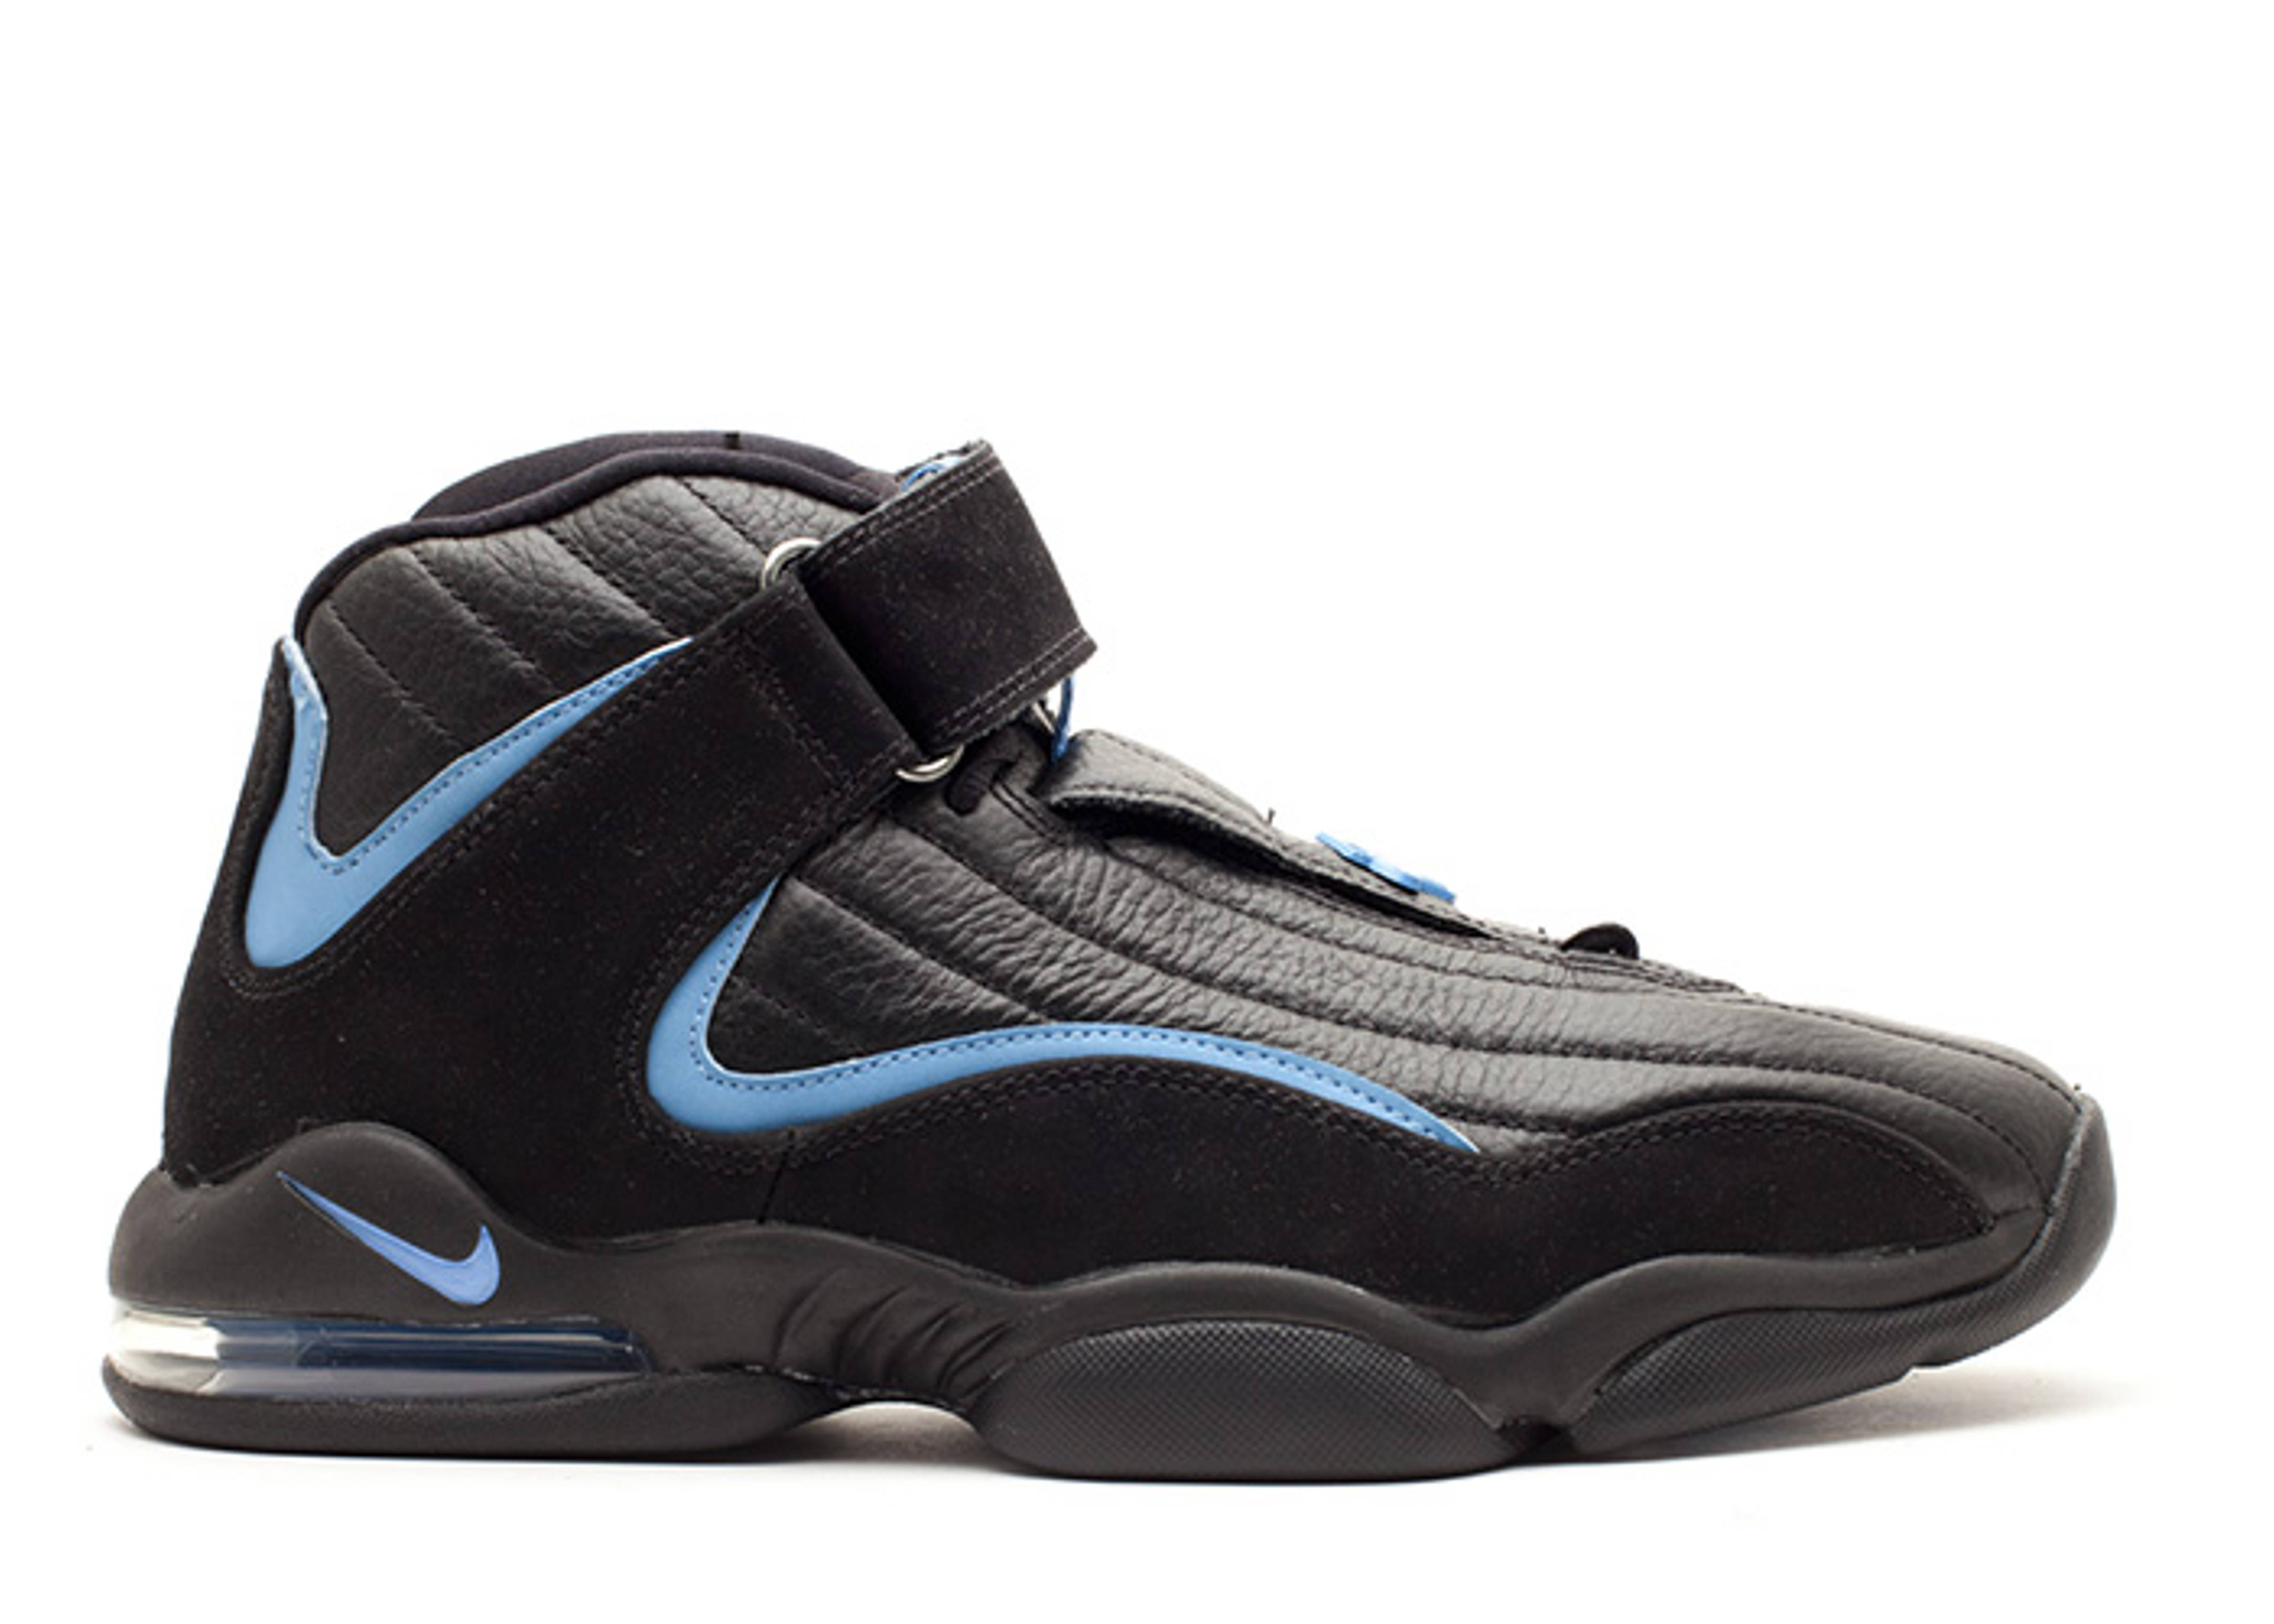 Nike Penny Air Max 4